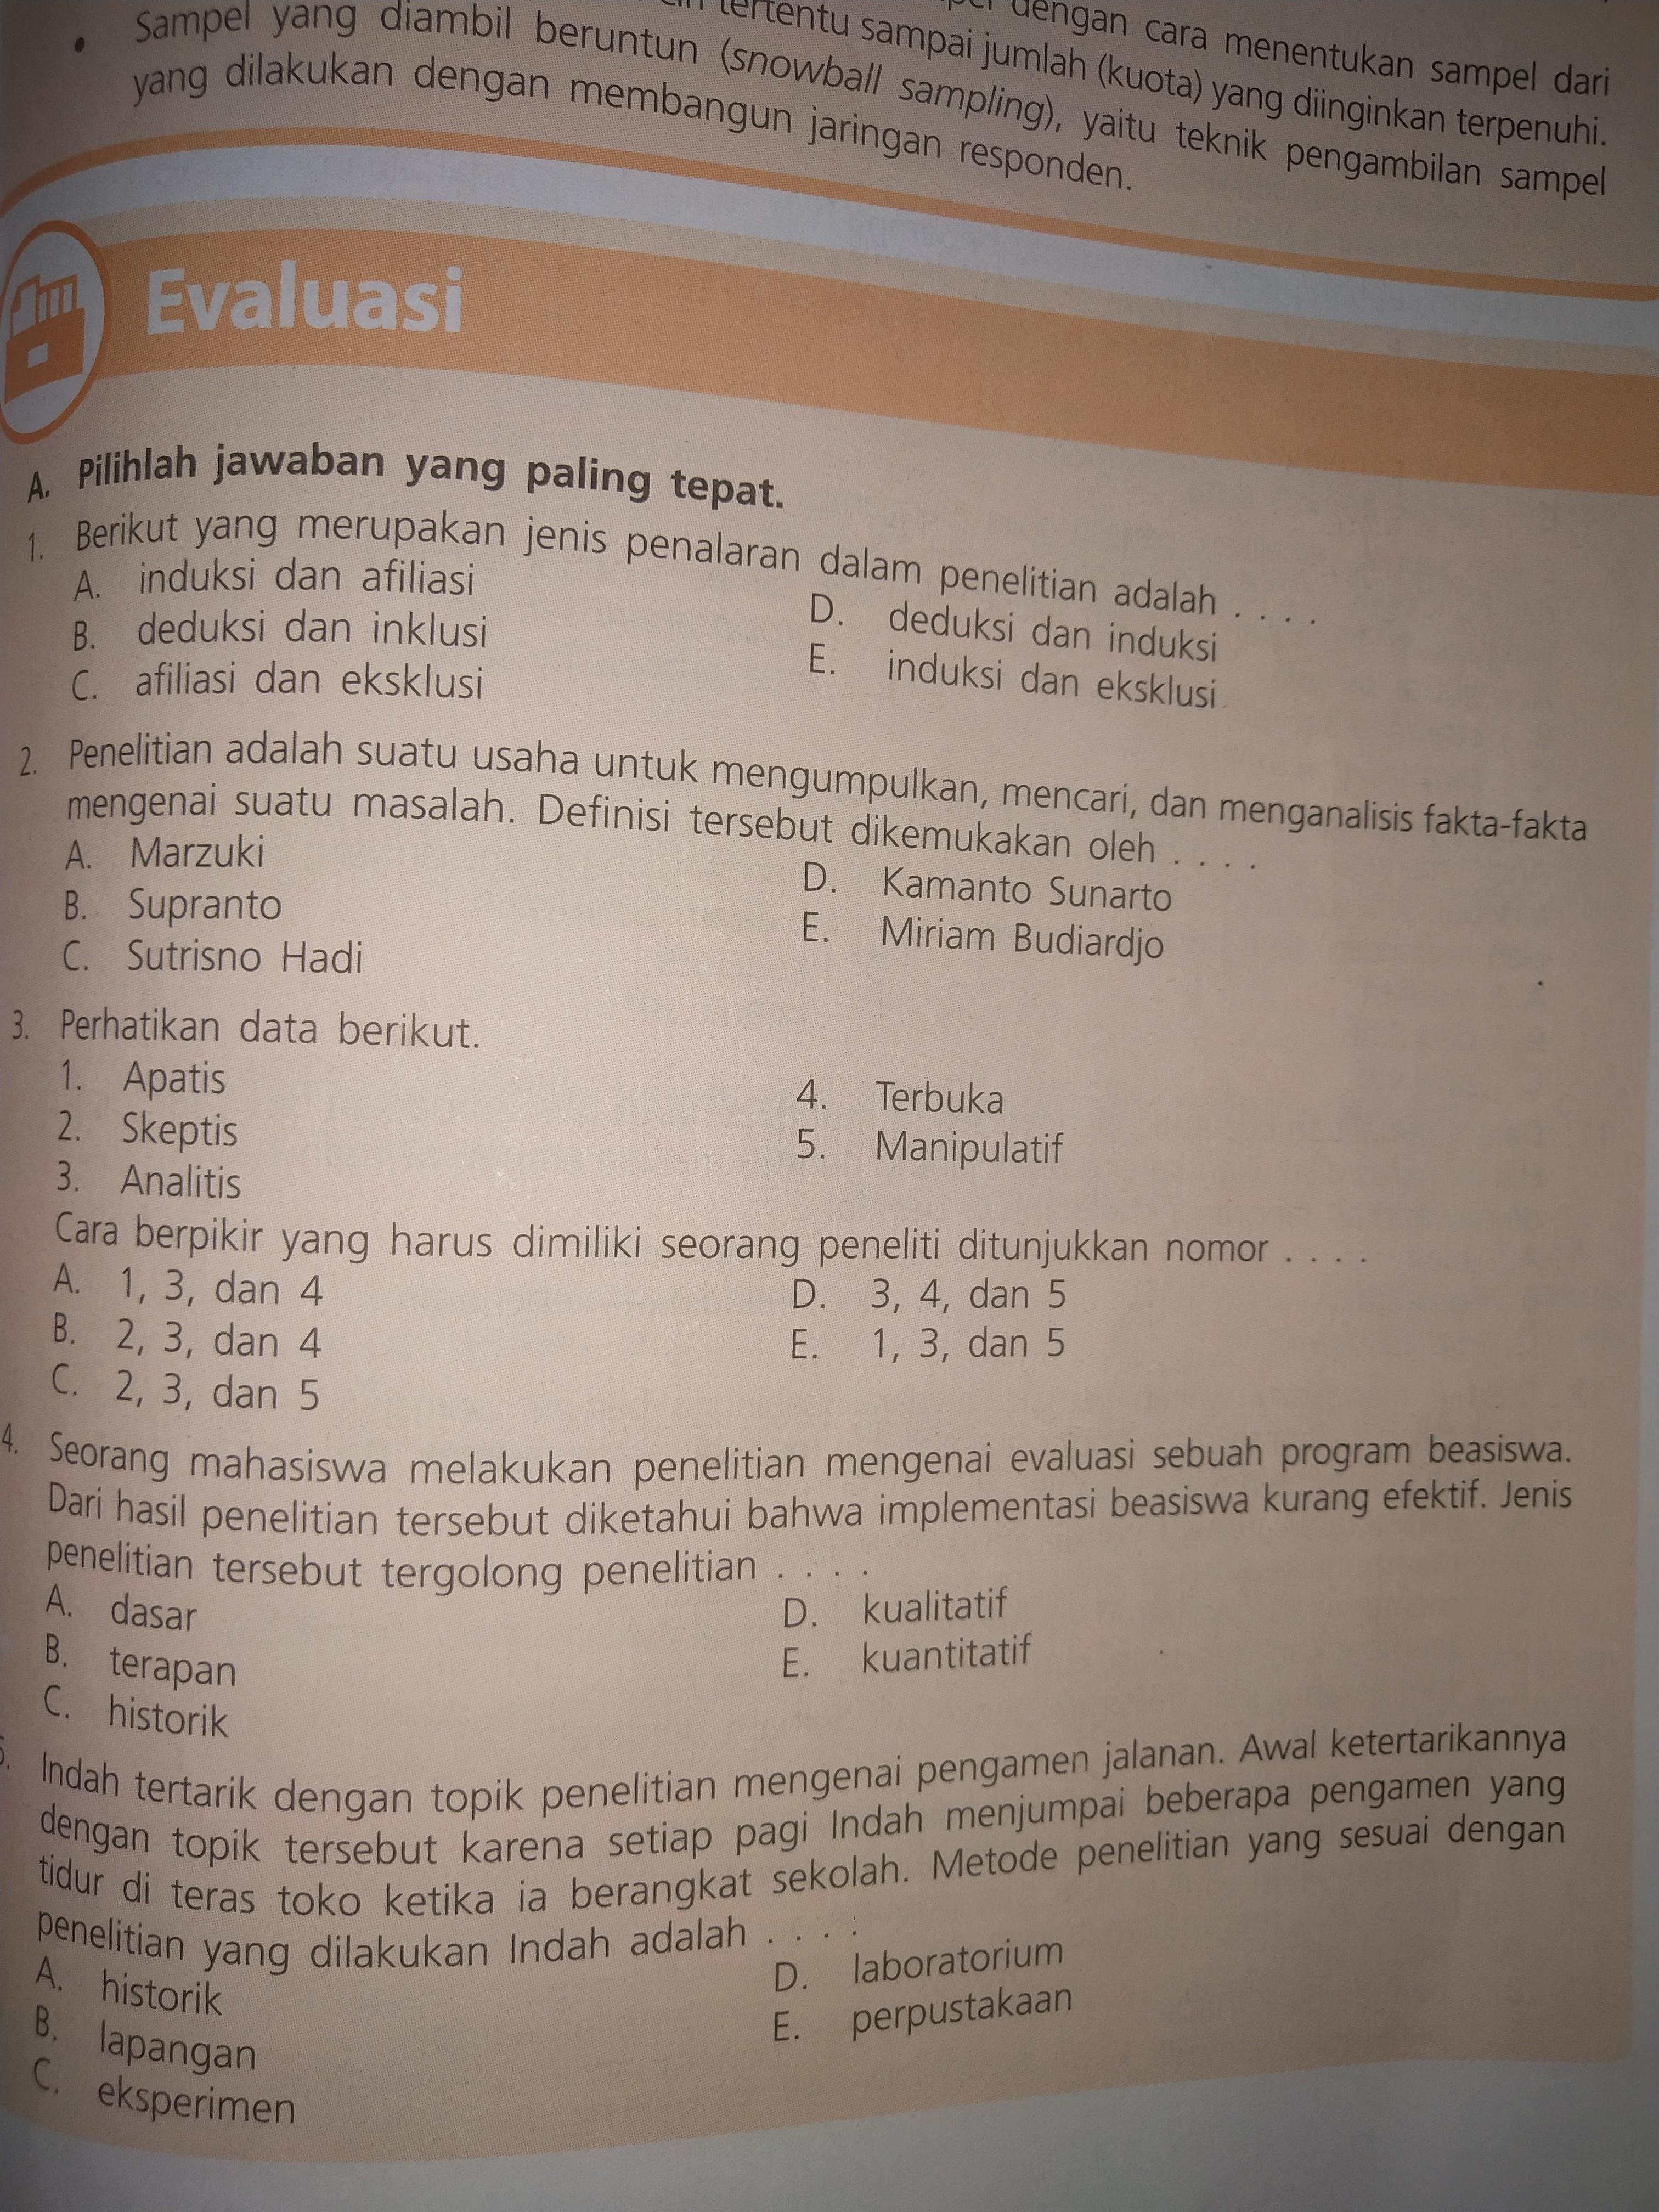 Jawaban Sosiologi Kelas 10 Semester 2 Kurikulum 2013 Halaman 193 Brainly Co Id